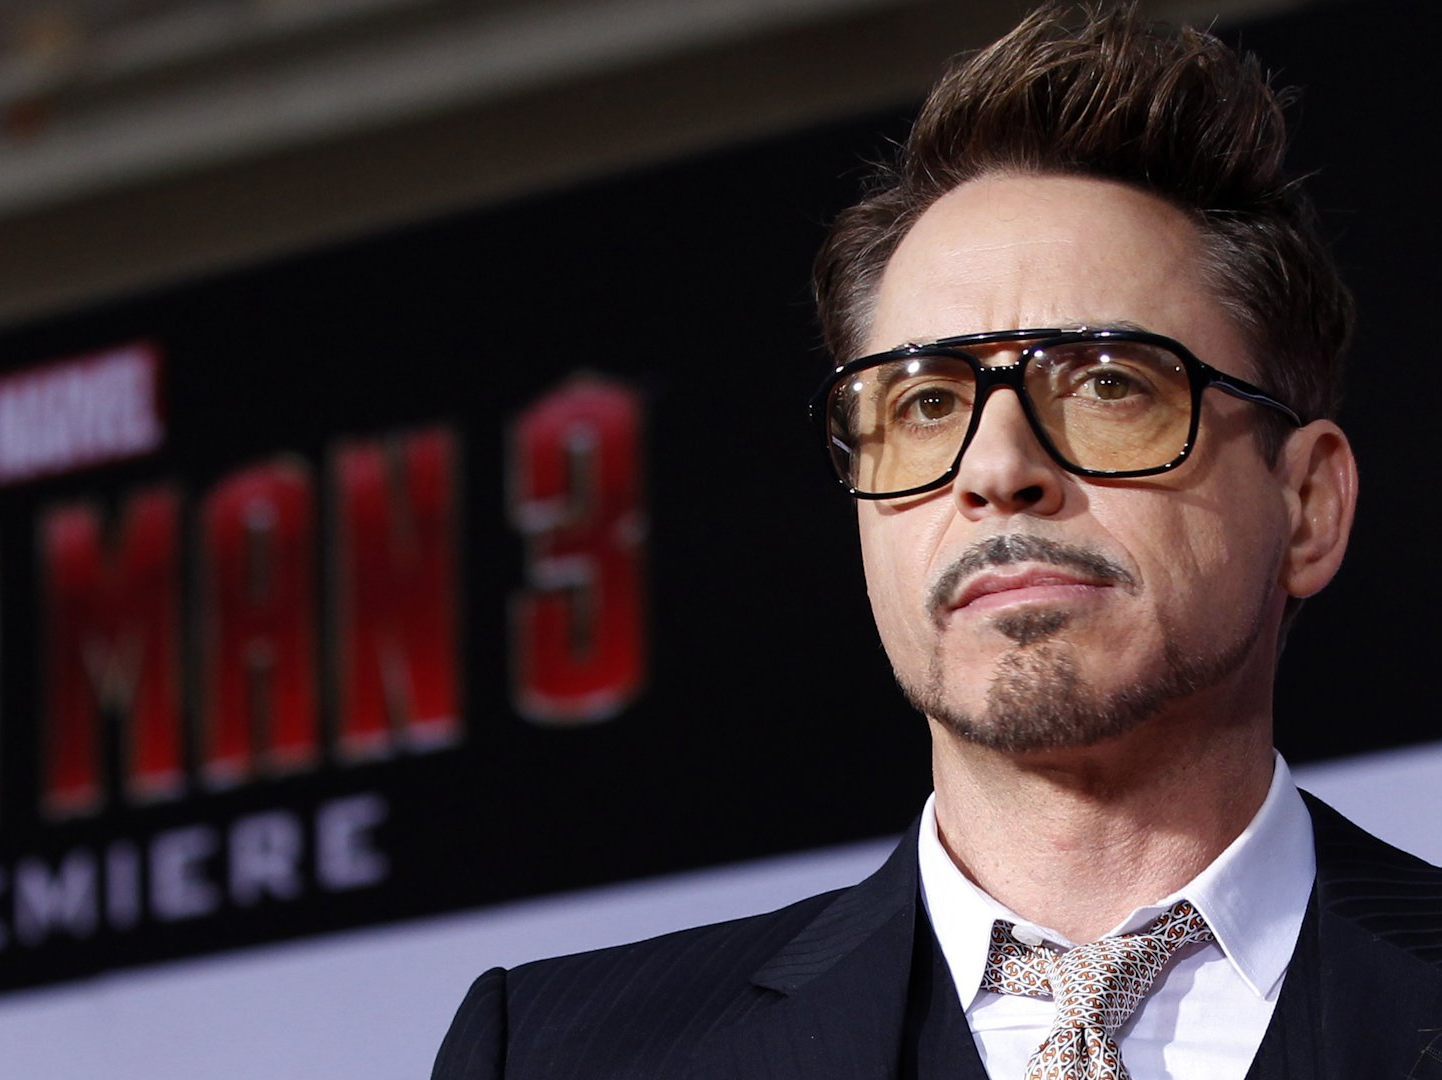 Robert Downey Jr Wallpapers Celebrity Hq Robert Downey Jr